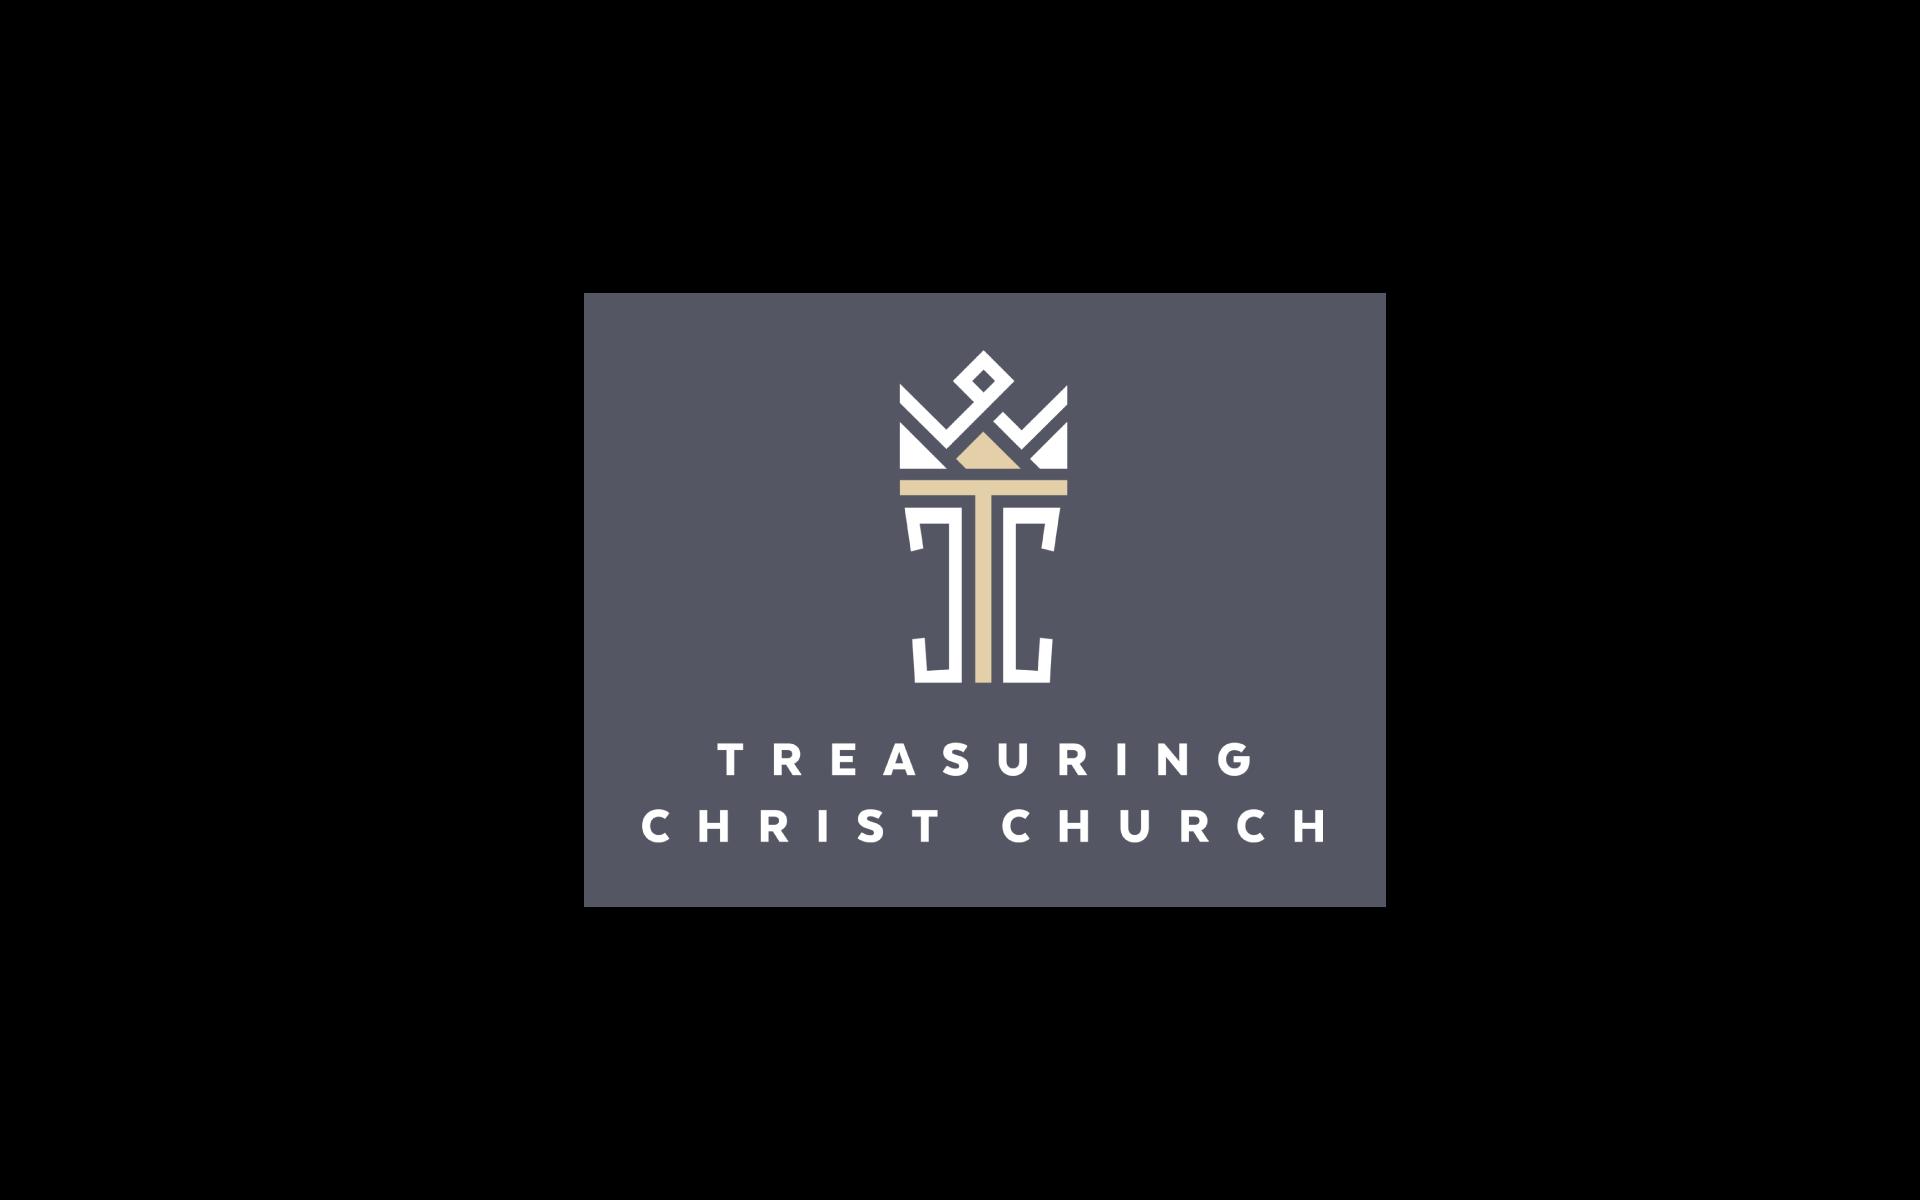 Treasuring-Christ-Church